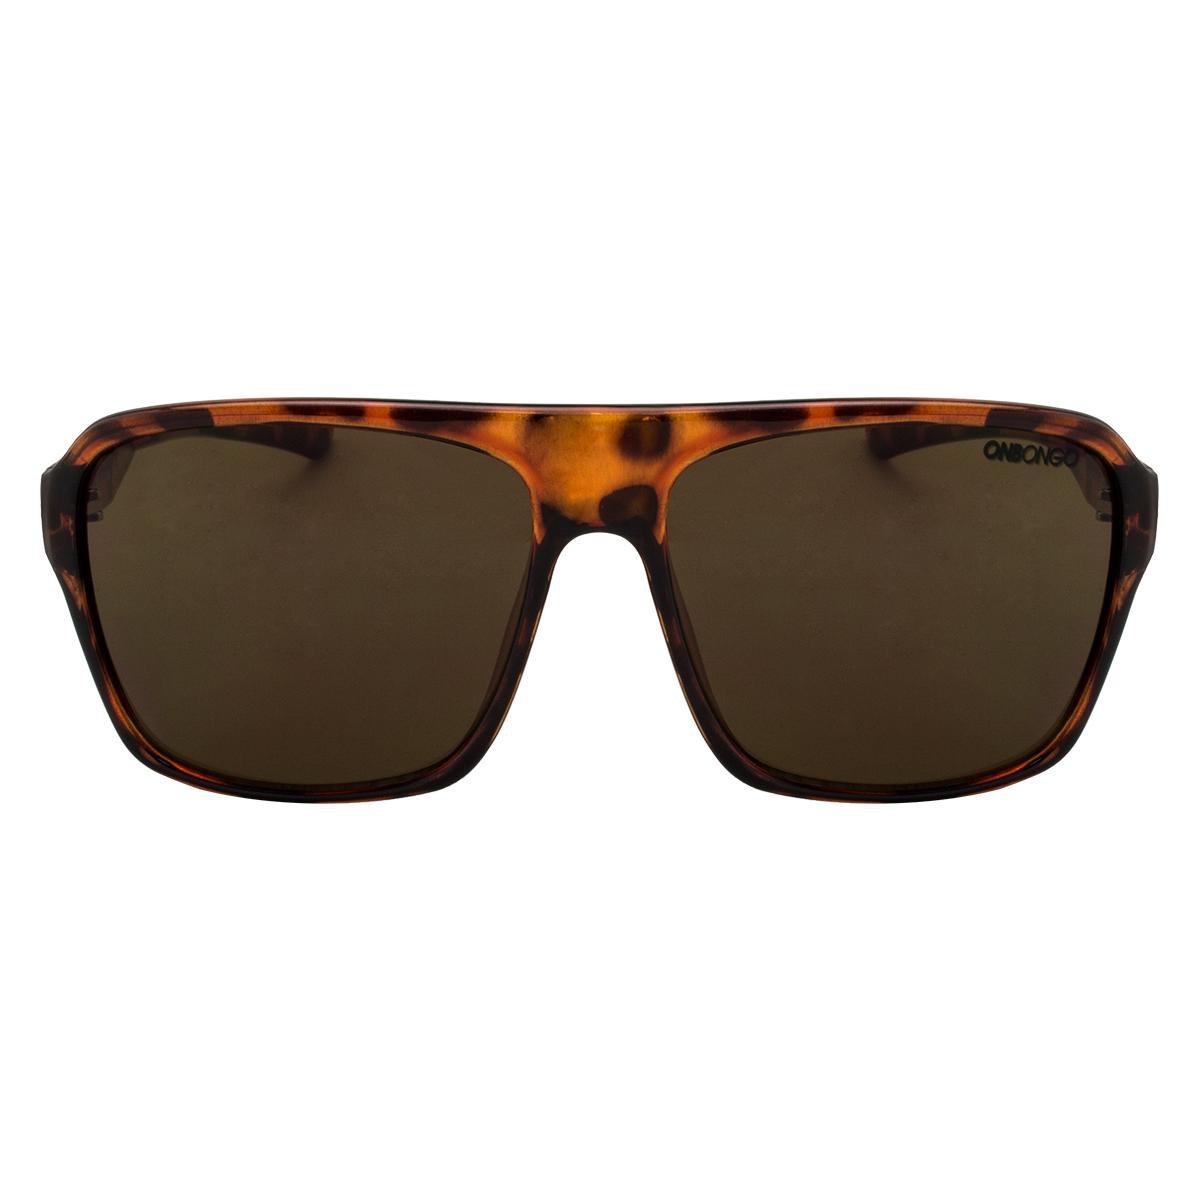 295689b8ff275 Óculos De Sol Onbongo Onbs008 - C2 - Masculino - Compre Agora   Zattini